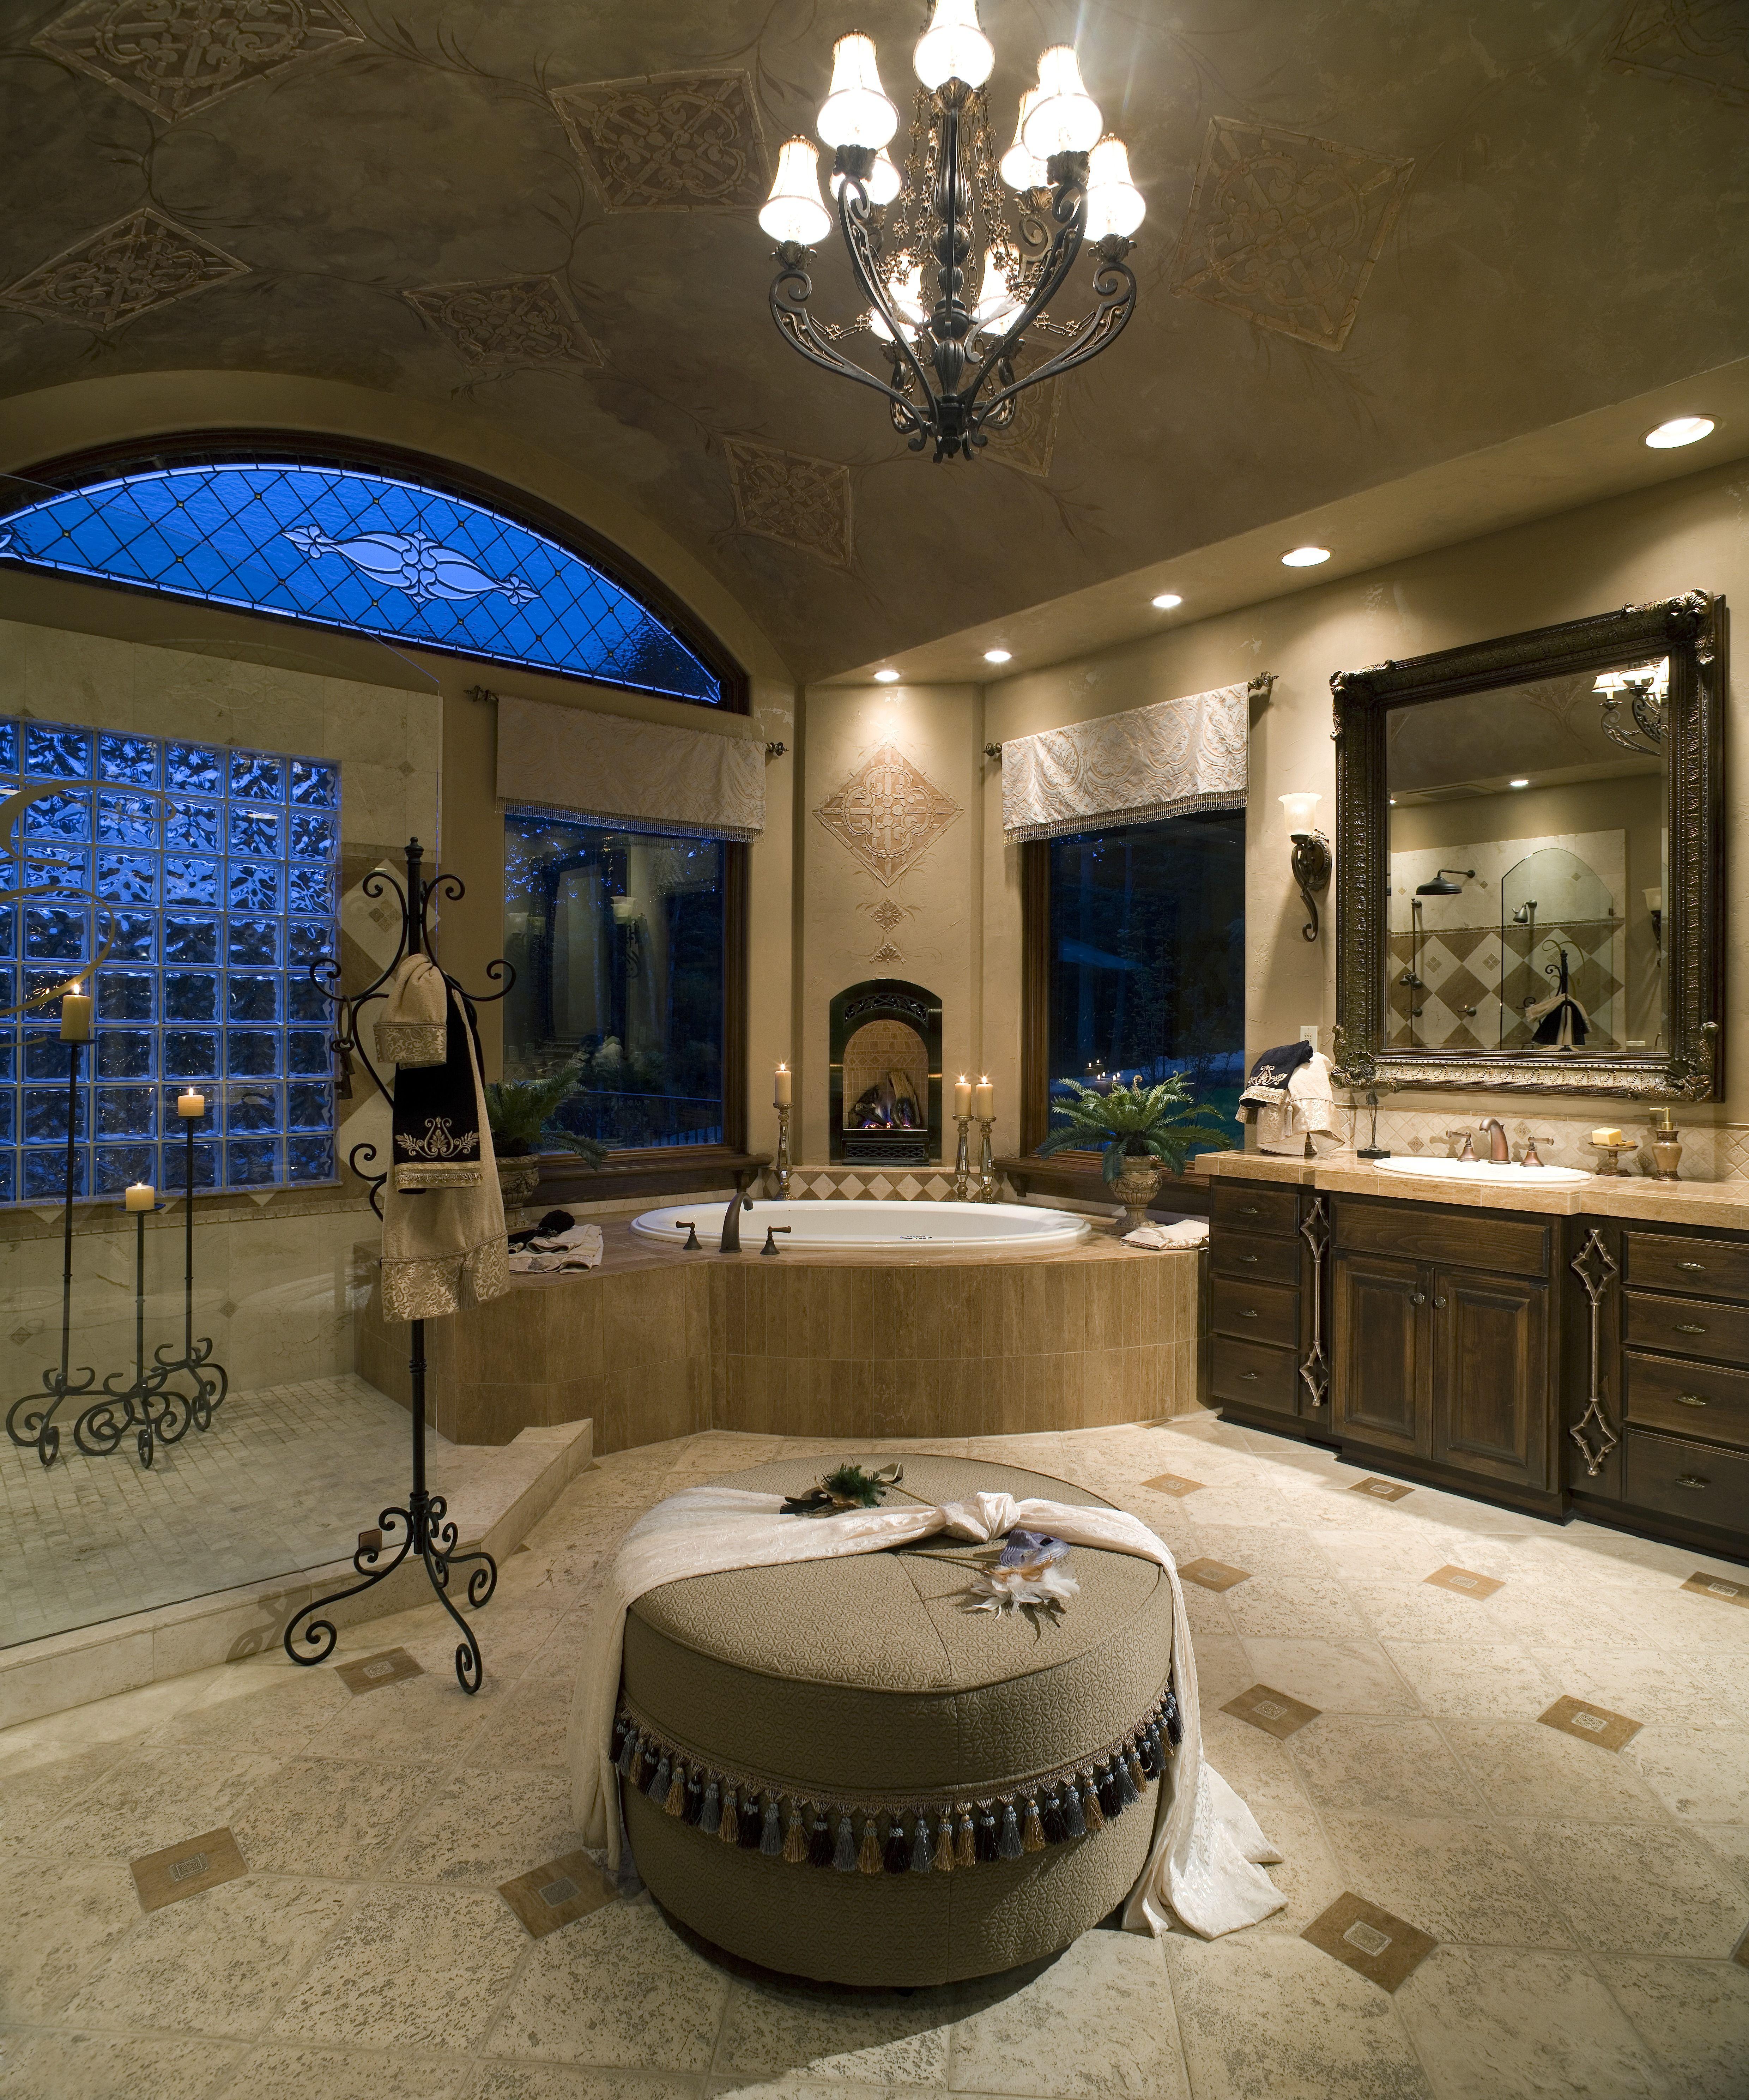 Luxury Master Bathroom Remodeling Ideas Luxury Master Bathrooms Bathroom Remodel Master Luxury Bathroom